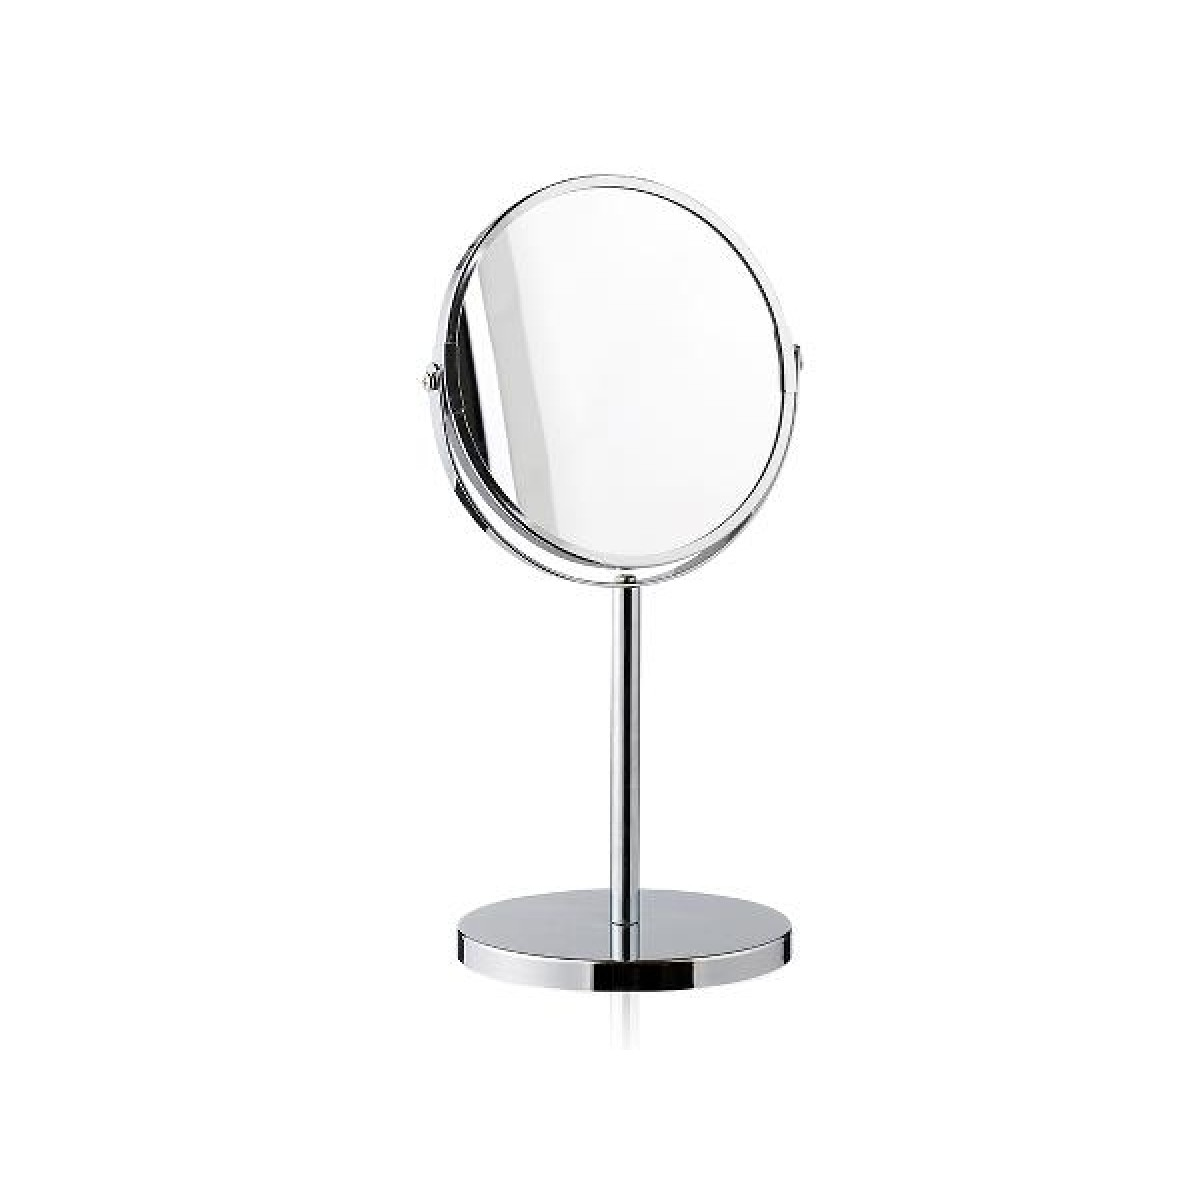 SCANDINAVIA Spejl med vippefunktion ø 17 cm chrom blank